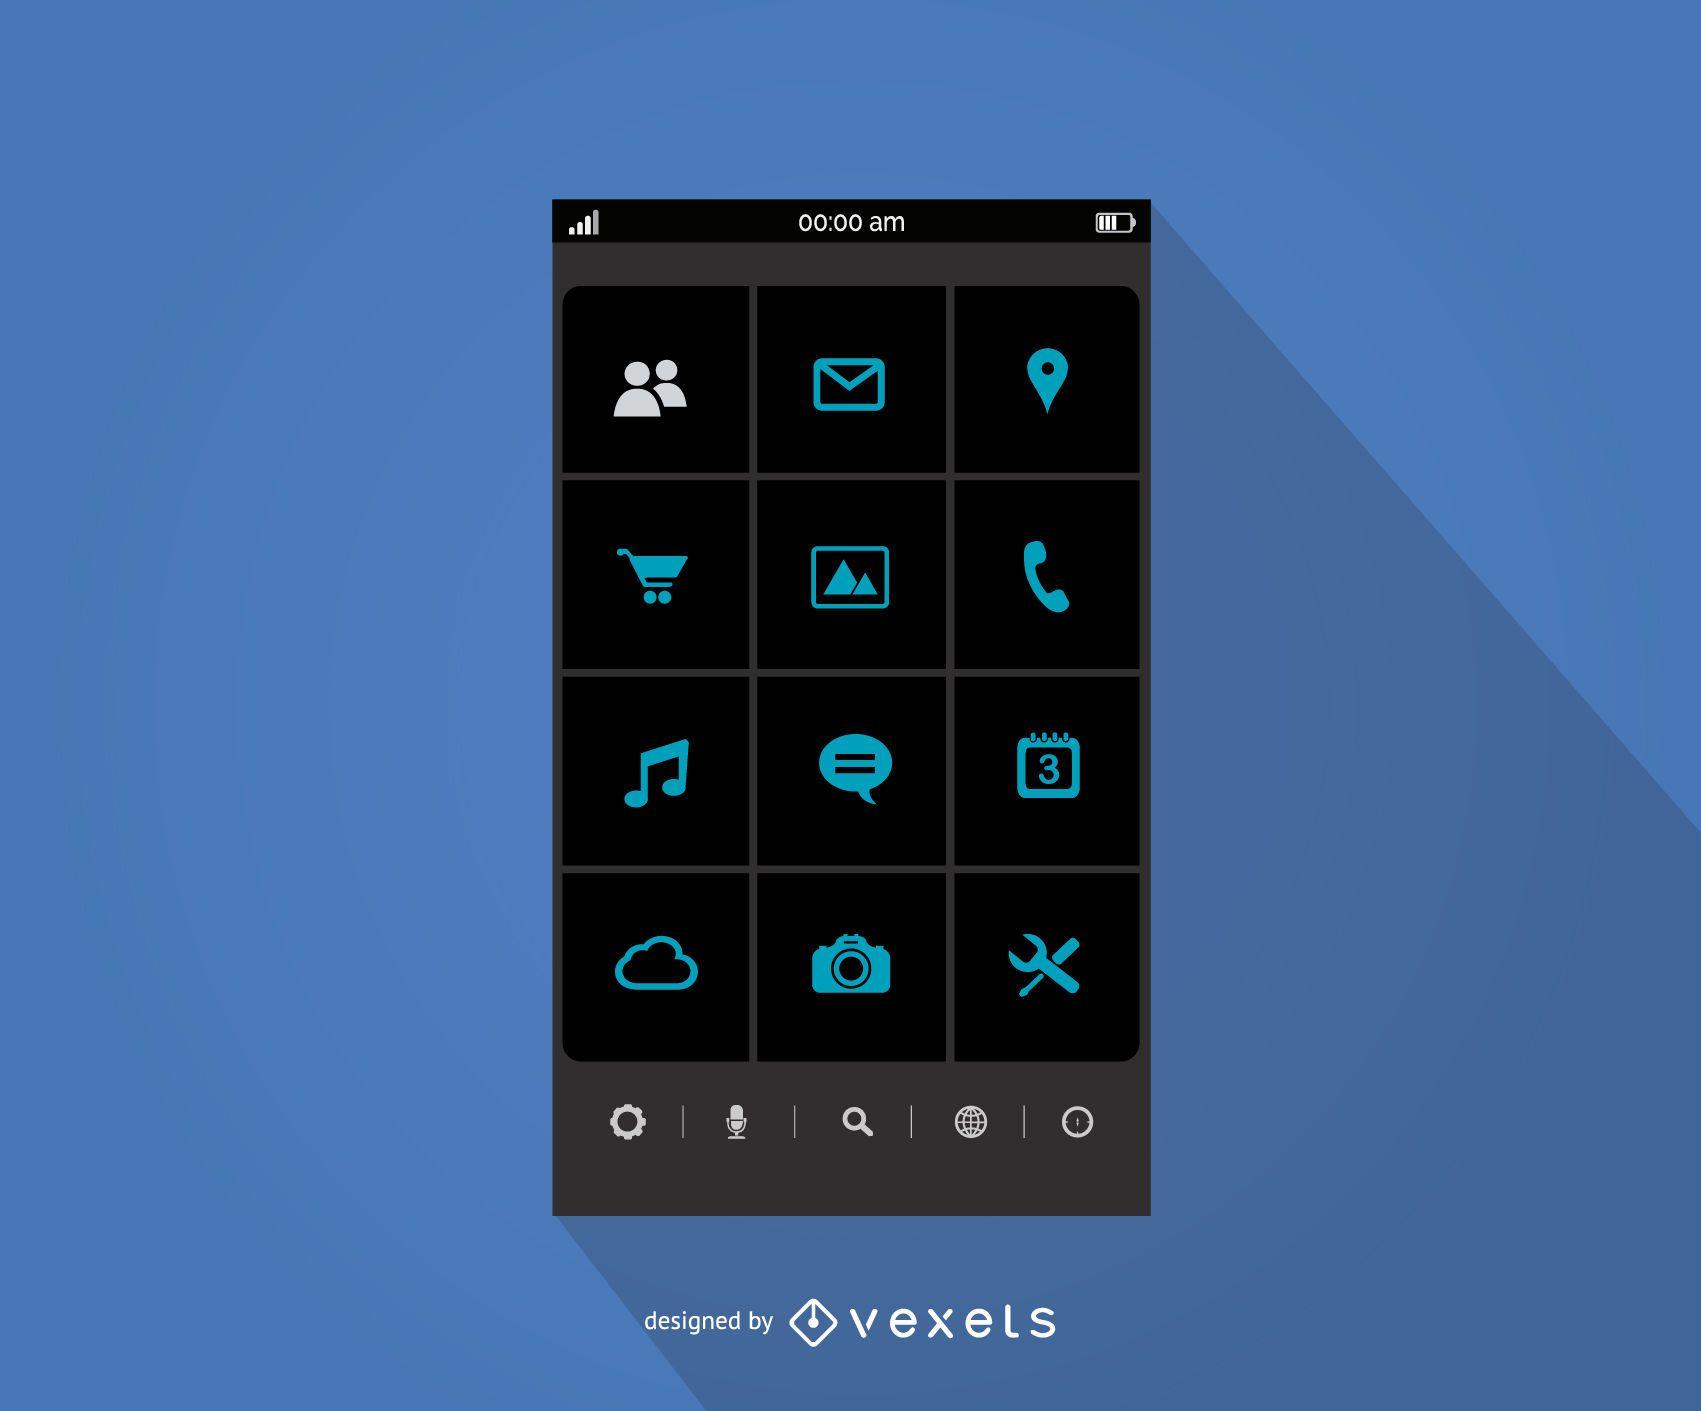 Mobile application menu interface template